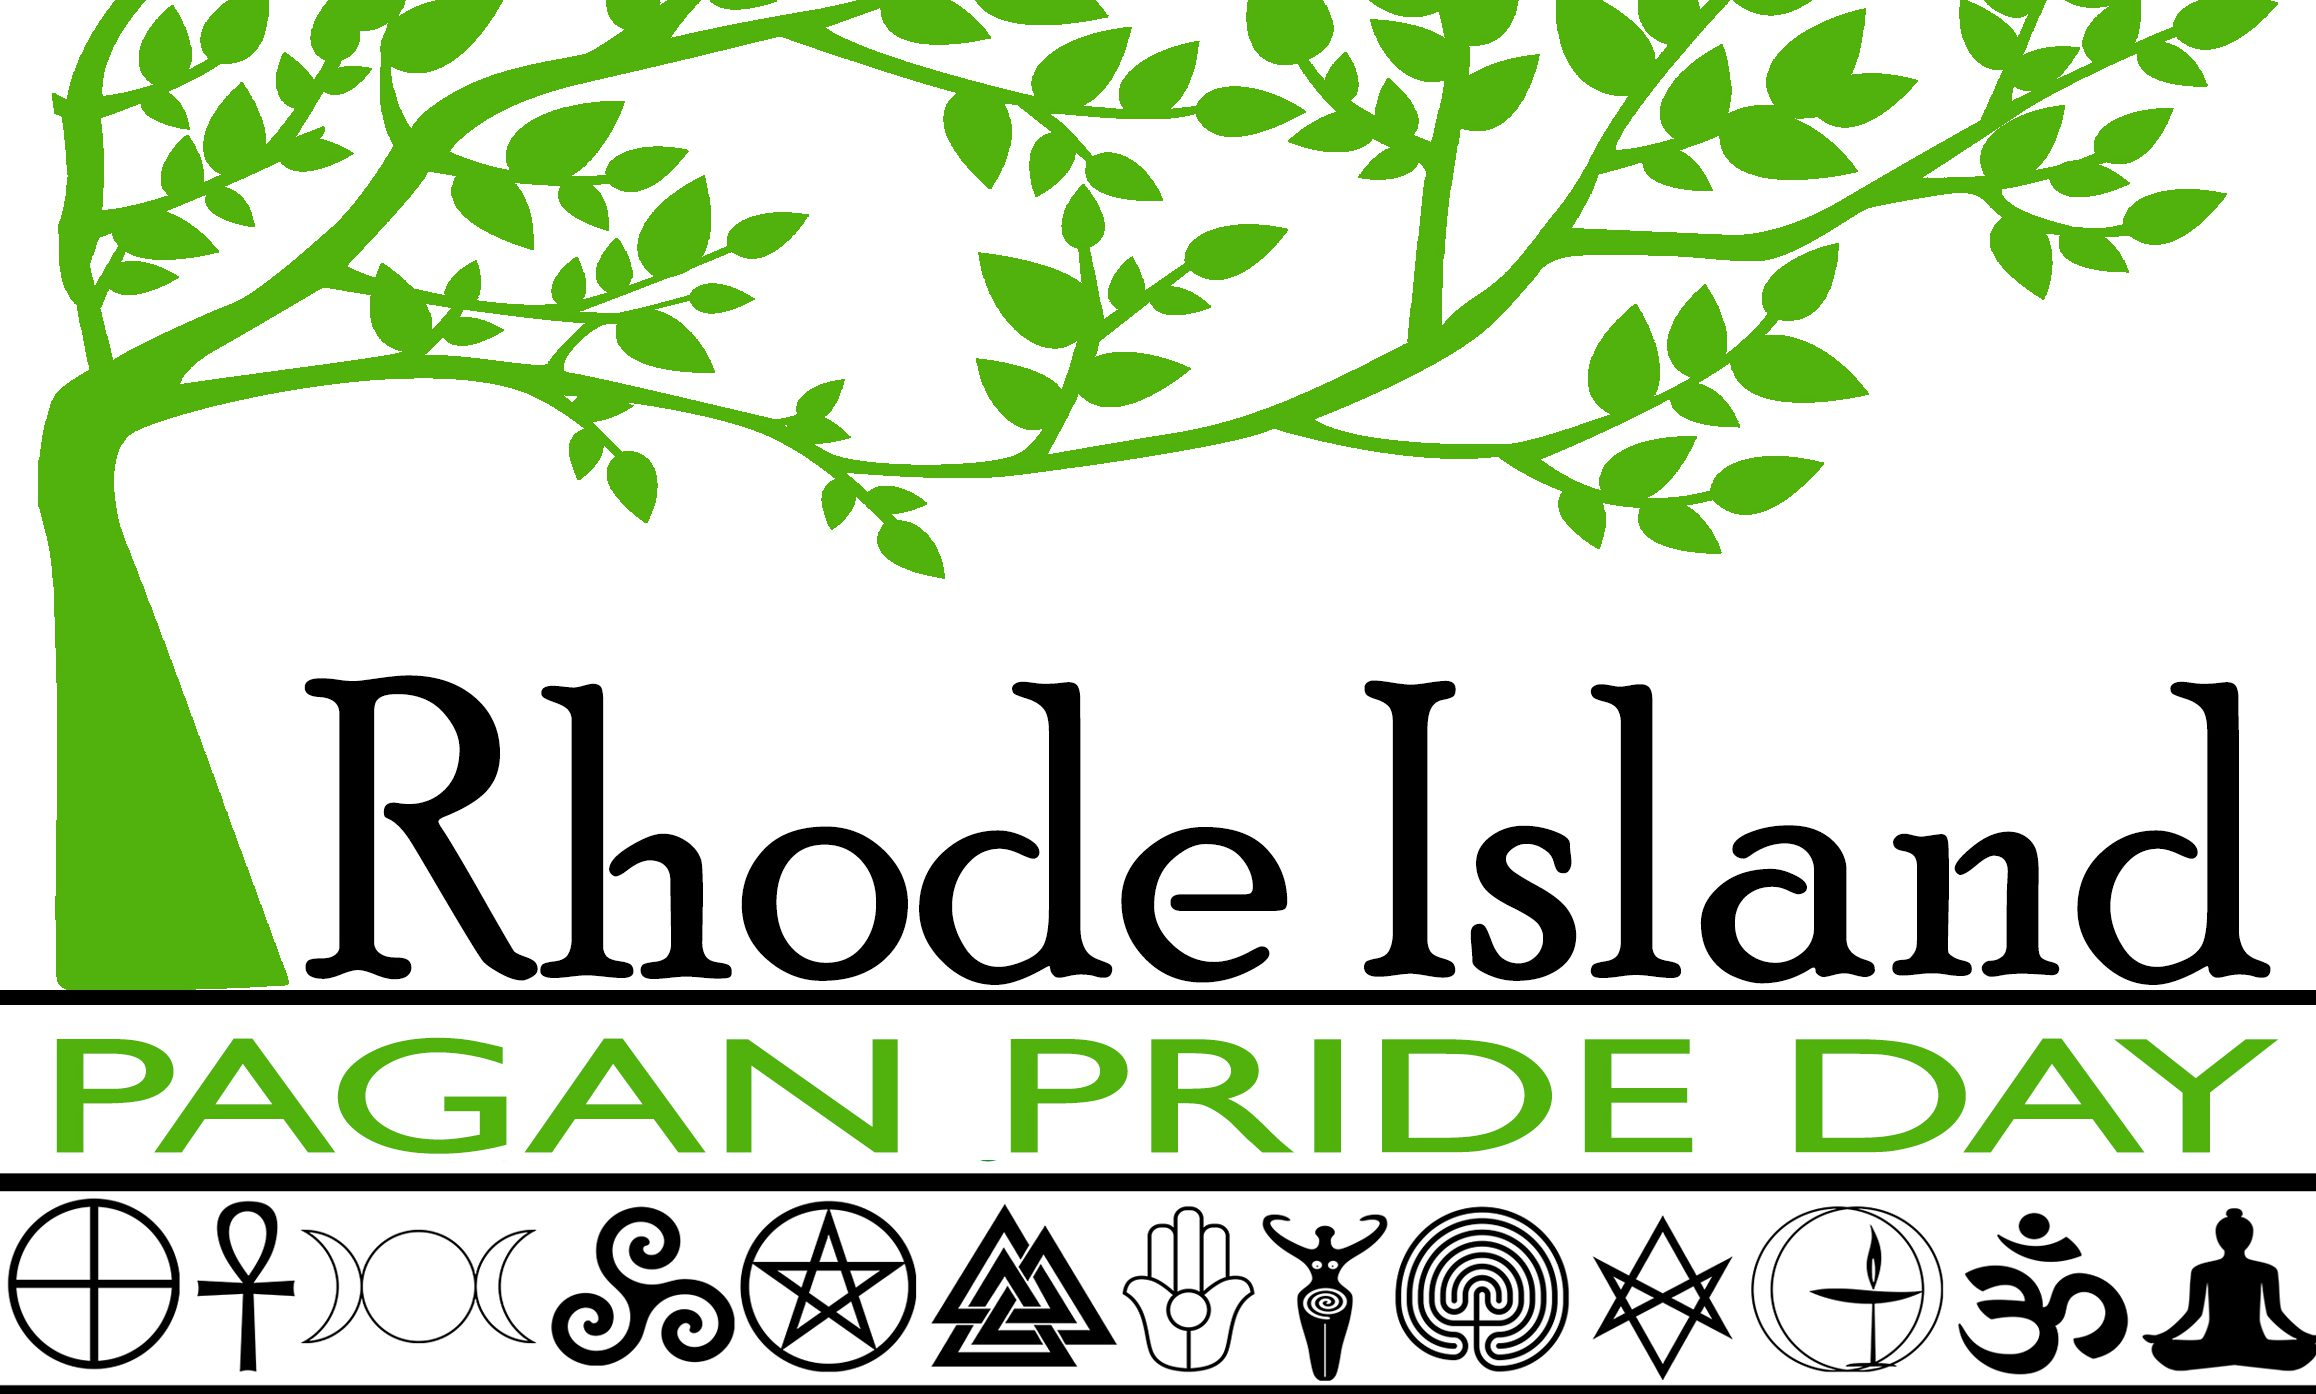 RI Pagan Pride